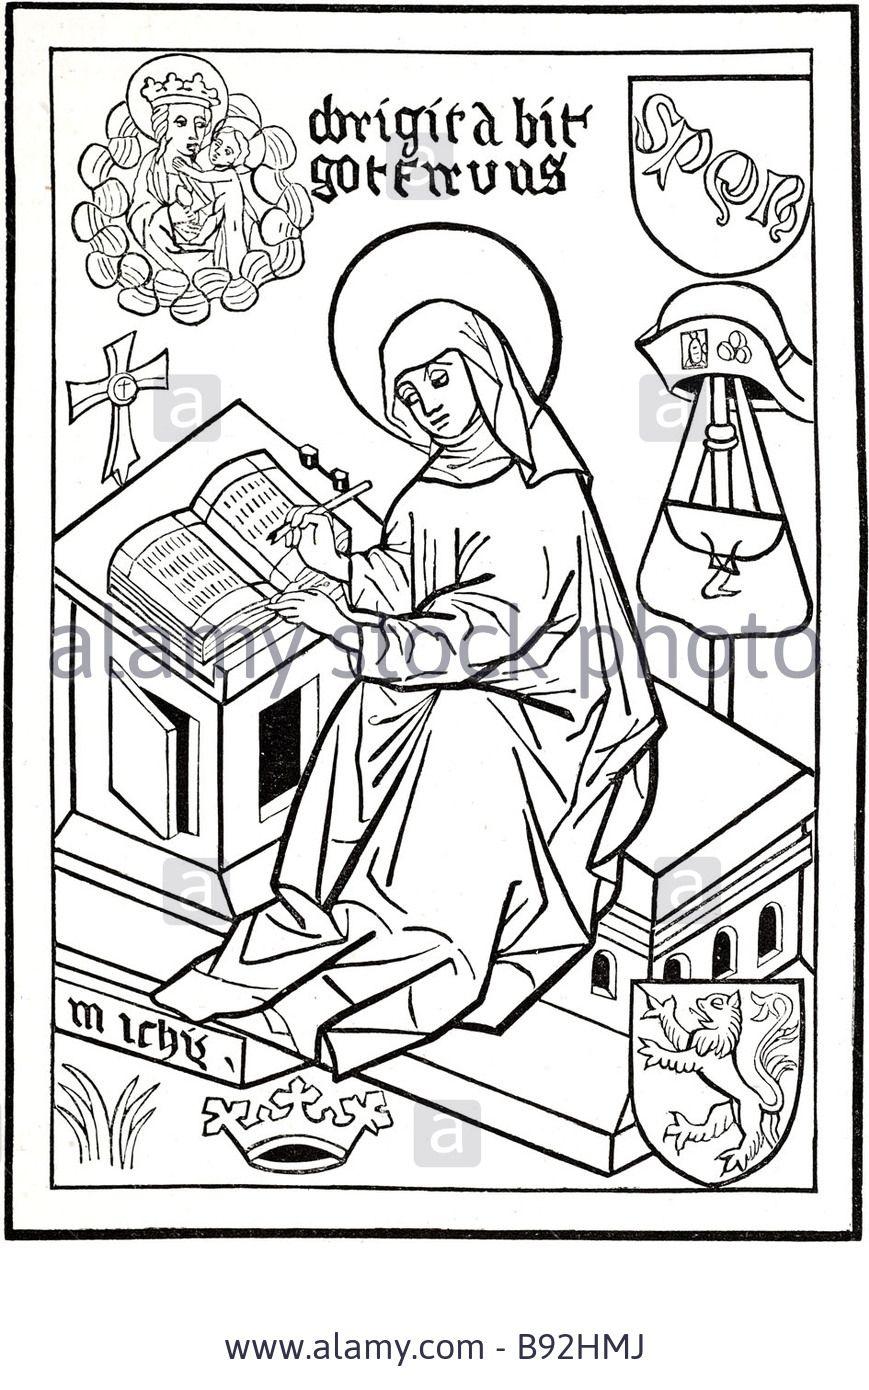 St Bridget Of Sweden 1302 1373 Virgin Figure Christ Birgitta Birgersdotter B92hmj Jpg 869 1390